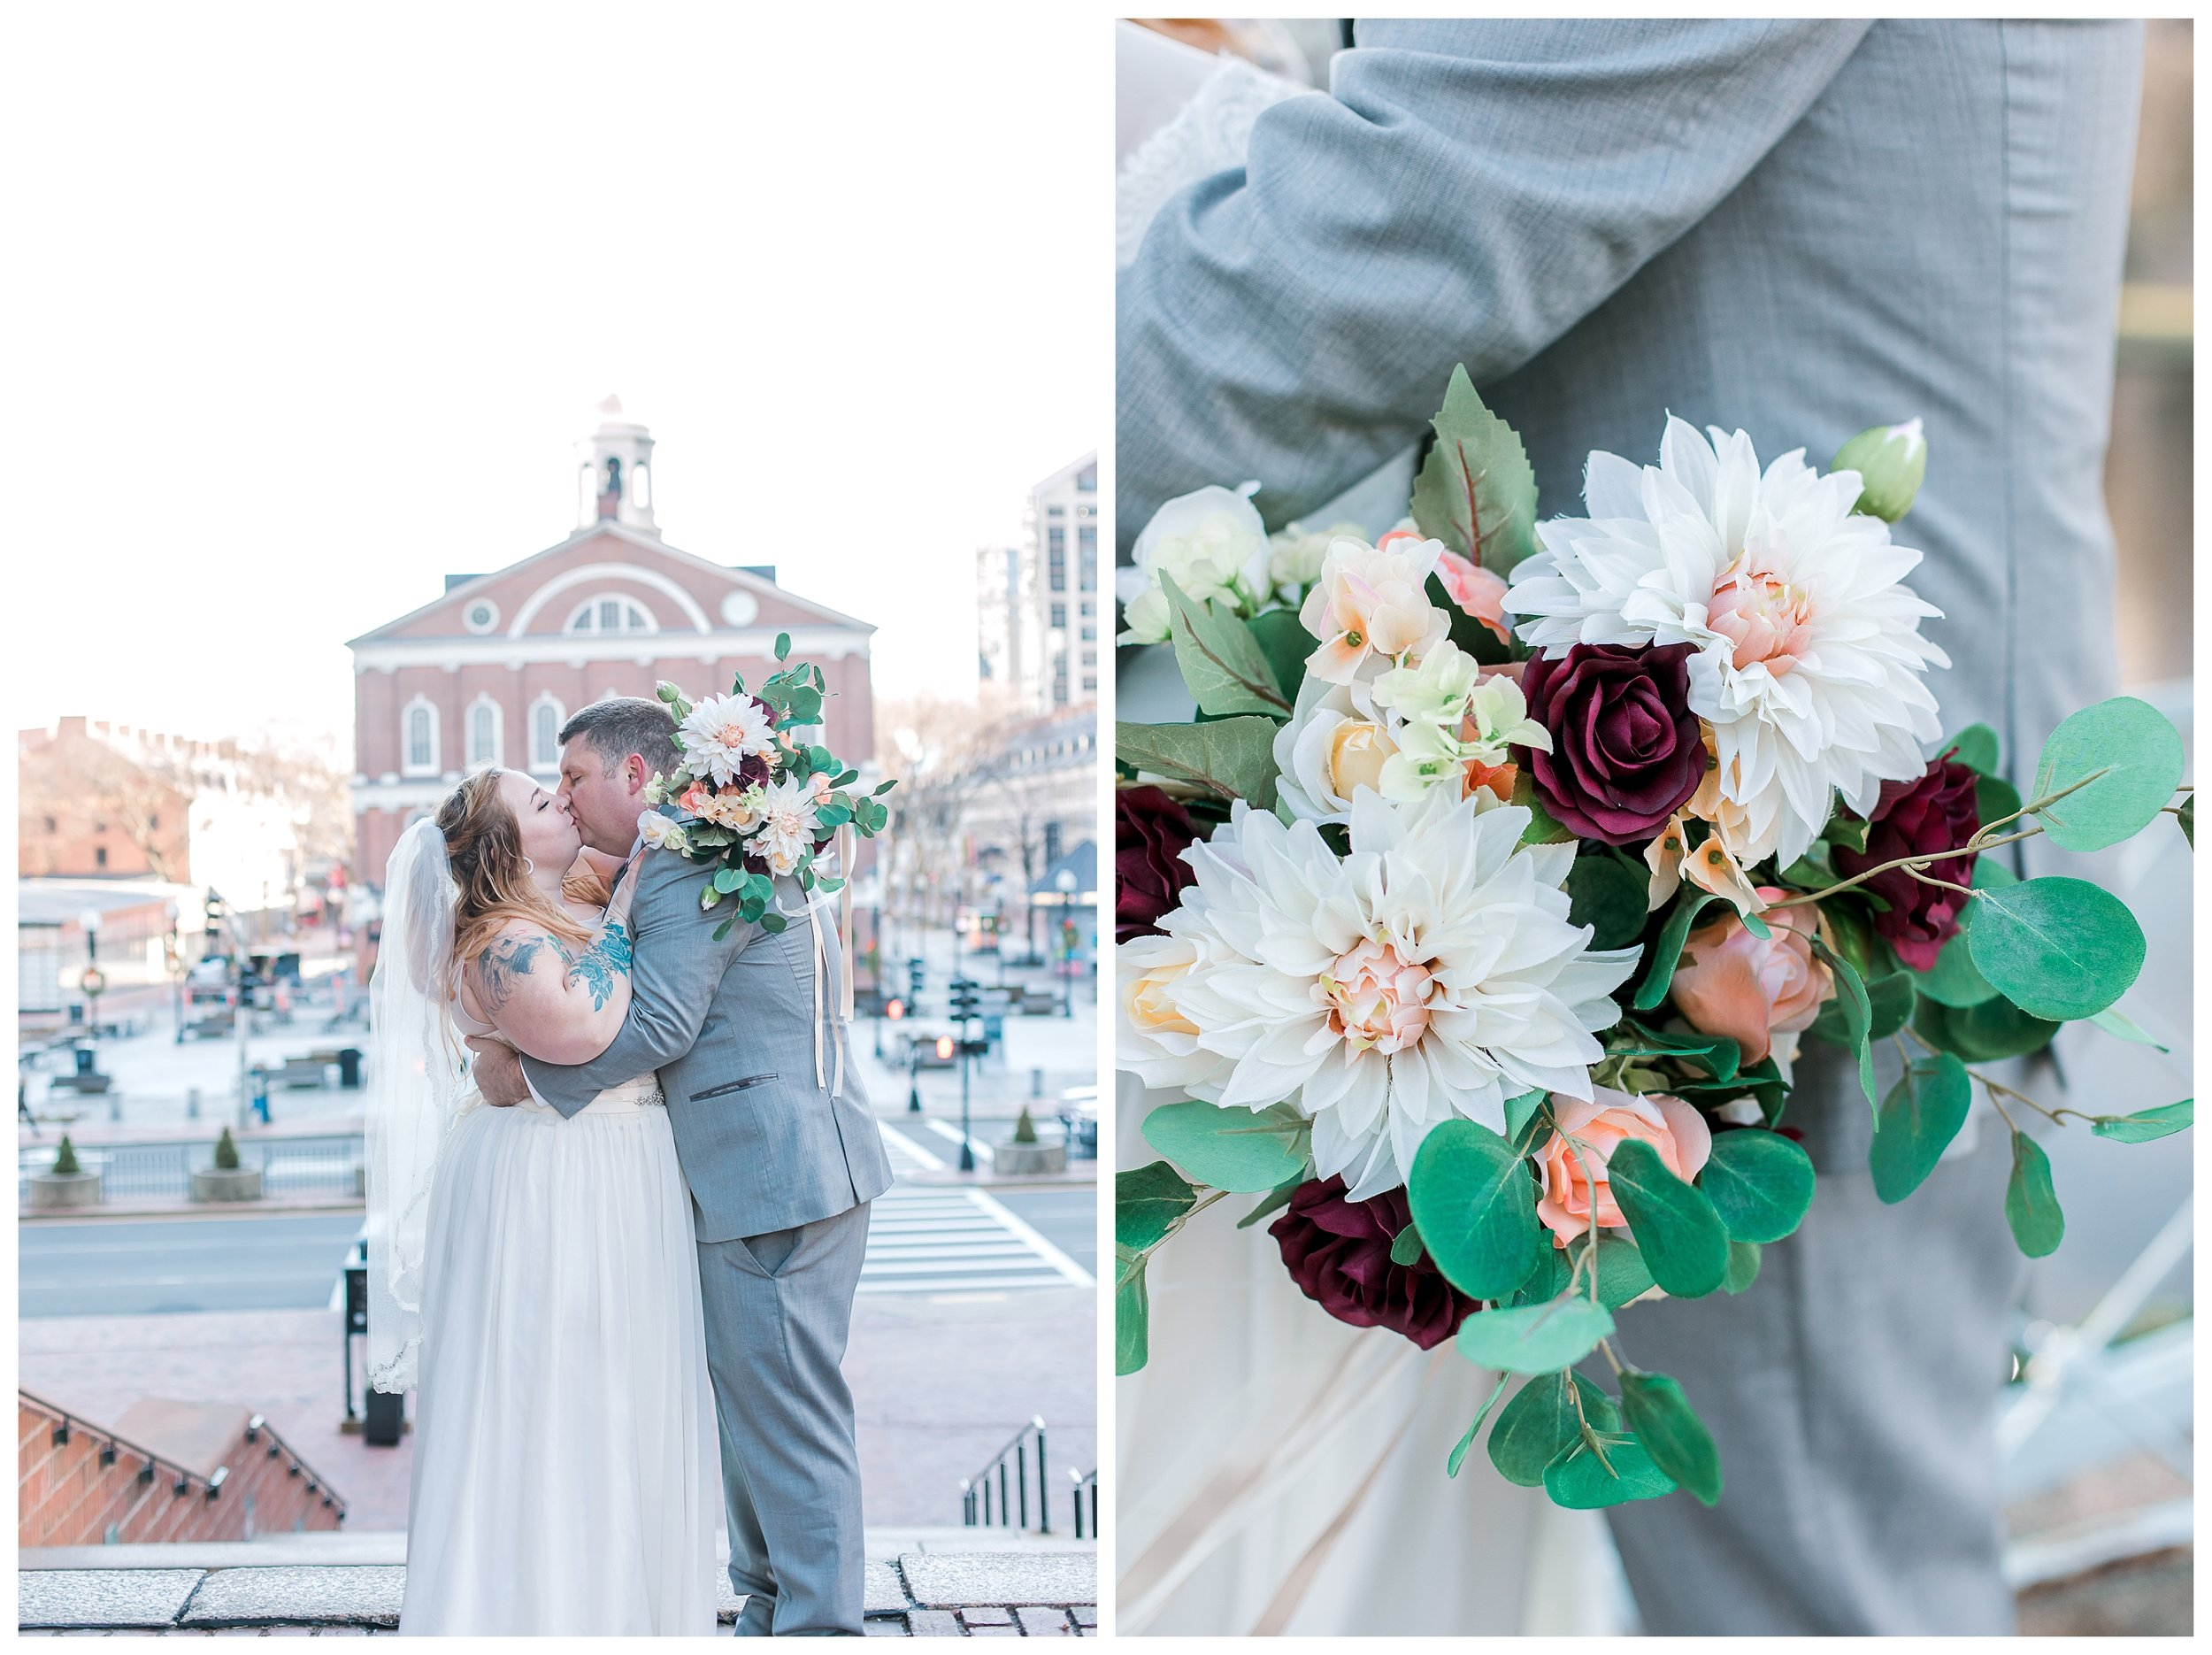 boston_seaport_fanueil_hall_elopement_photos_erica_pezente_photography (2).jpg